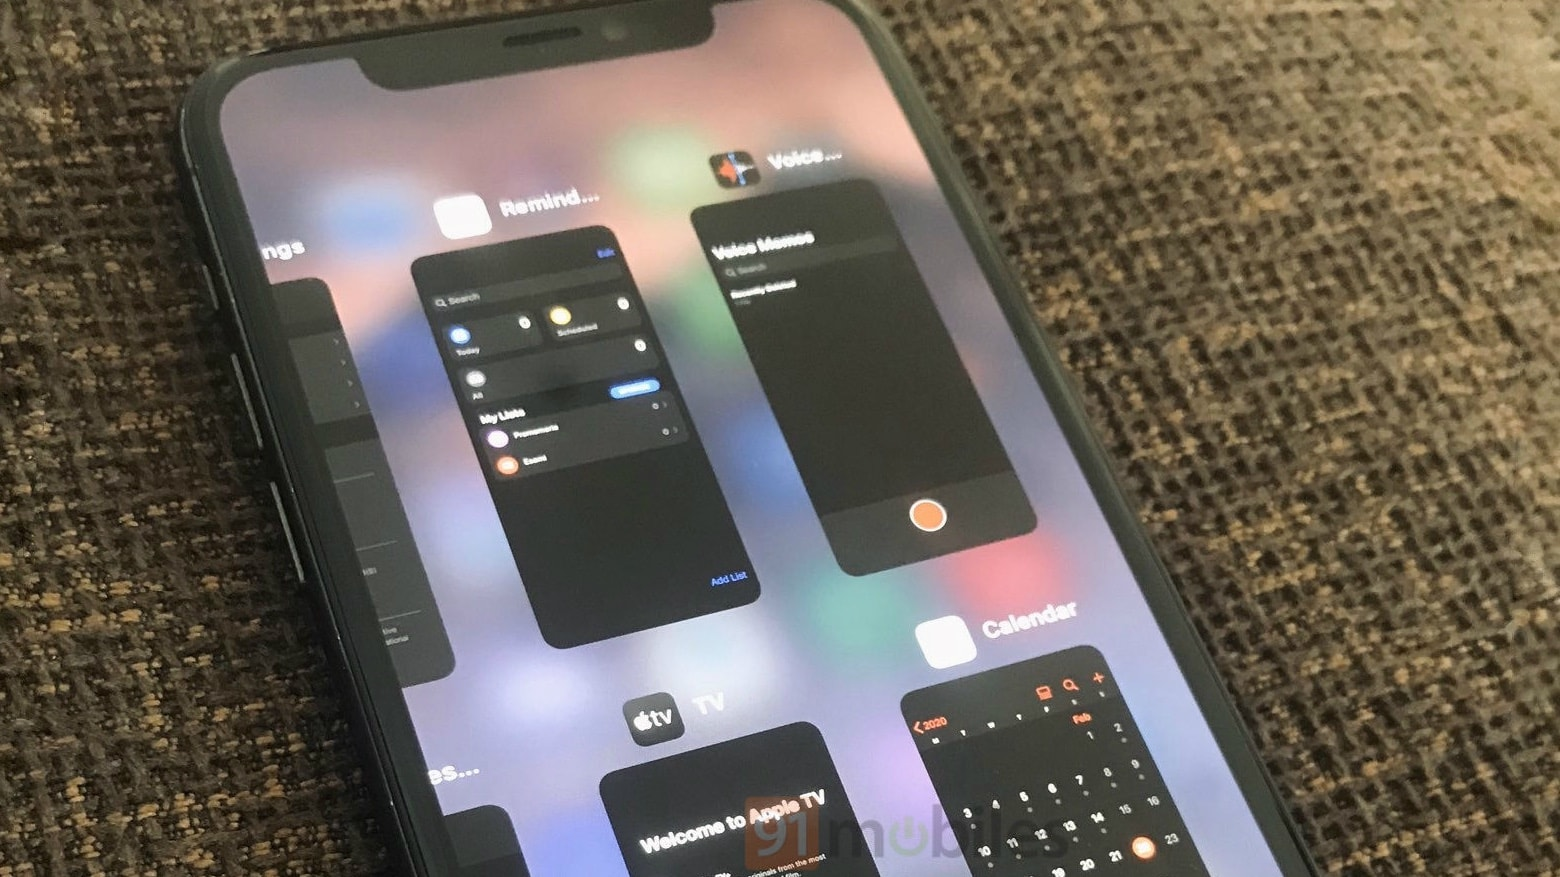 iOS 14 multitasking system borrows from iPadOS